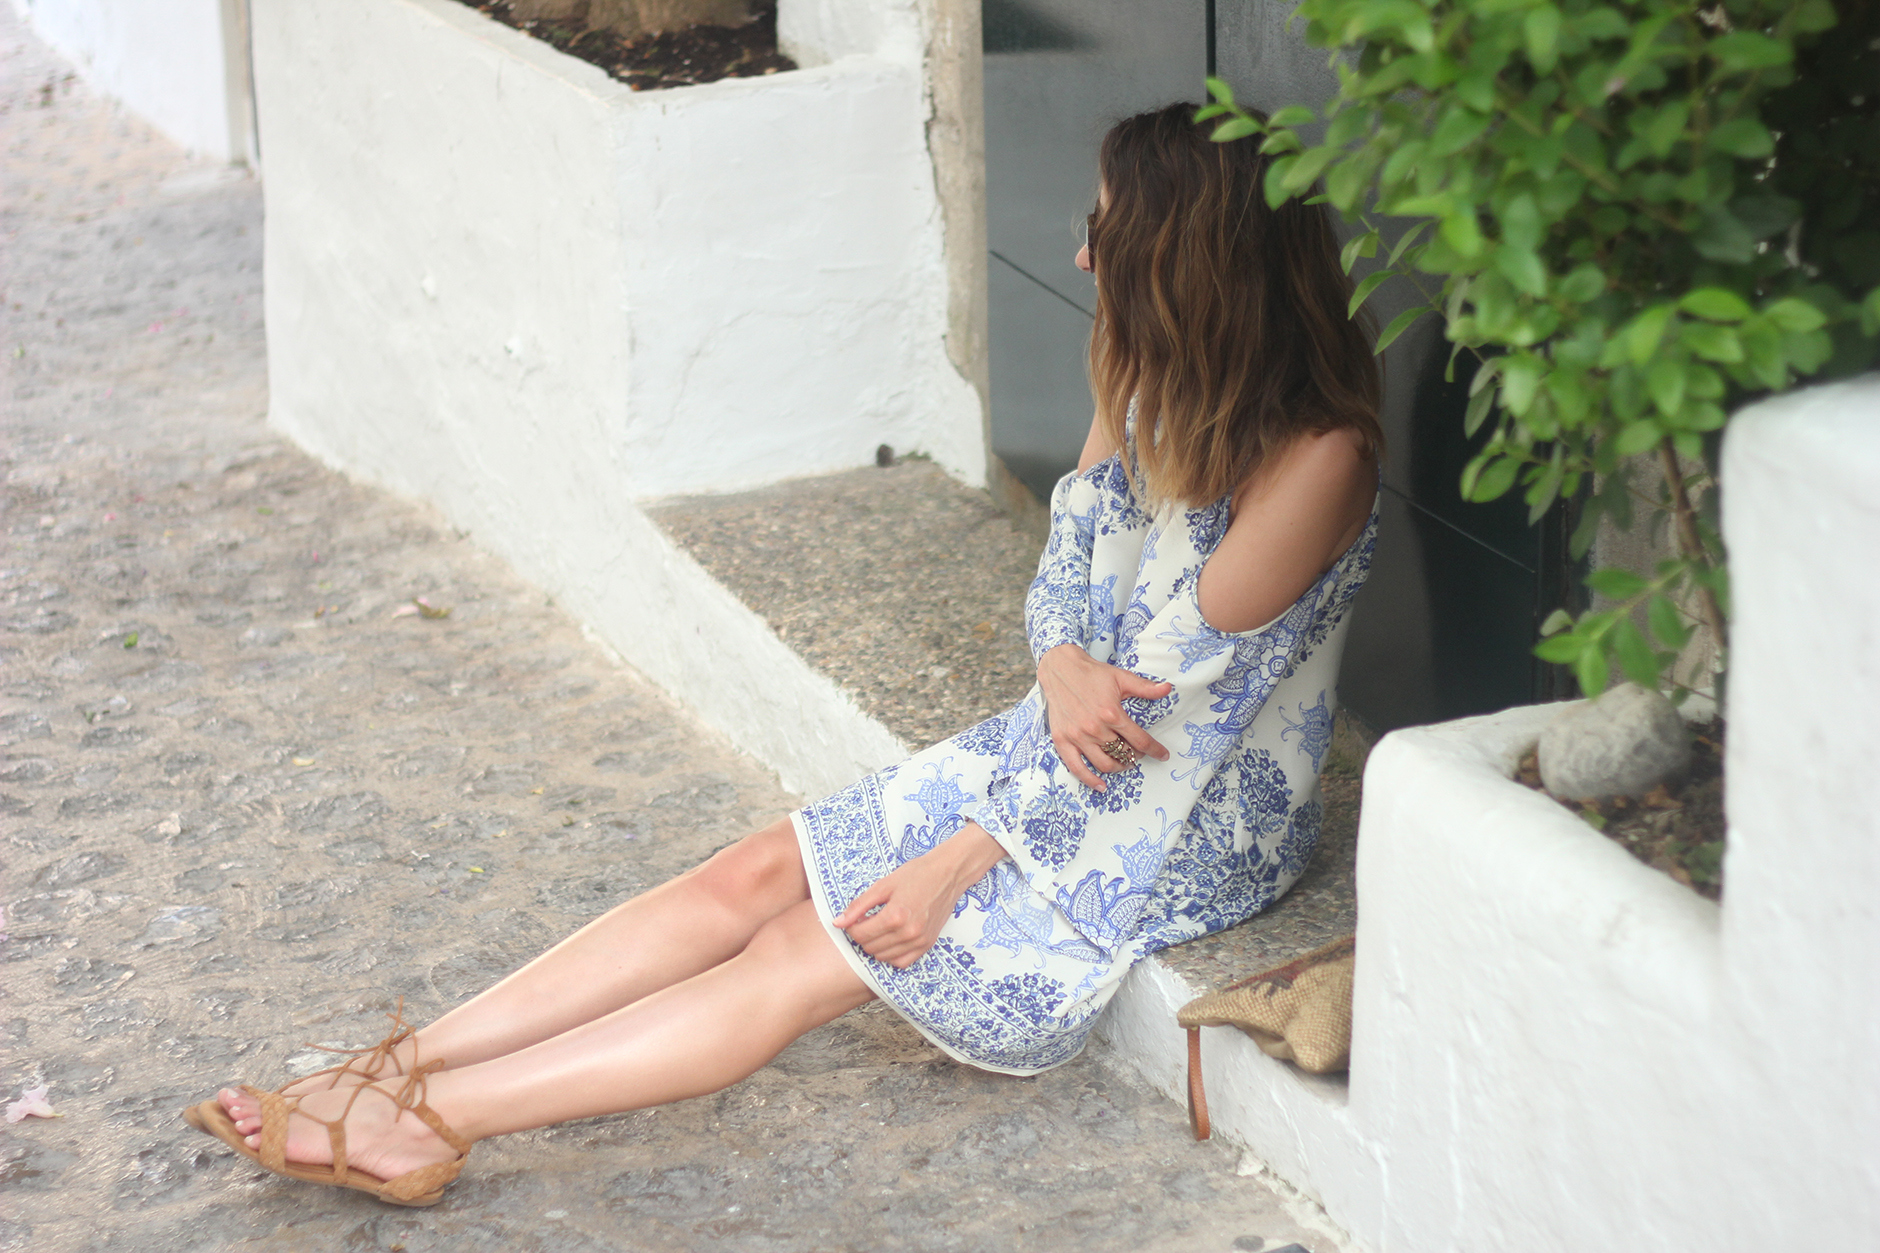 Summer White And Blue Dress Ibiza19